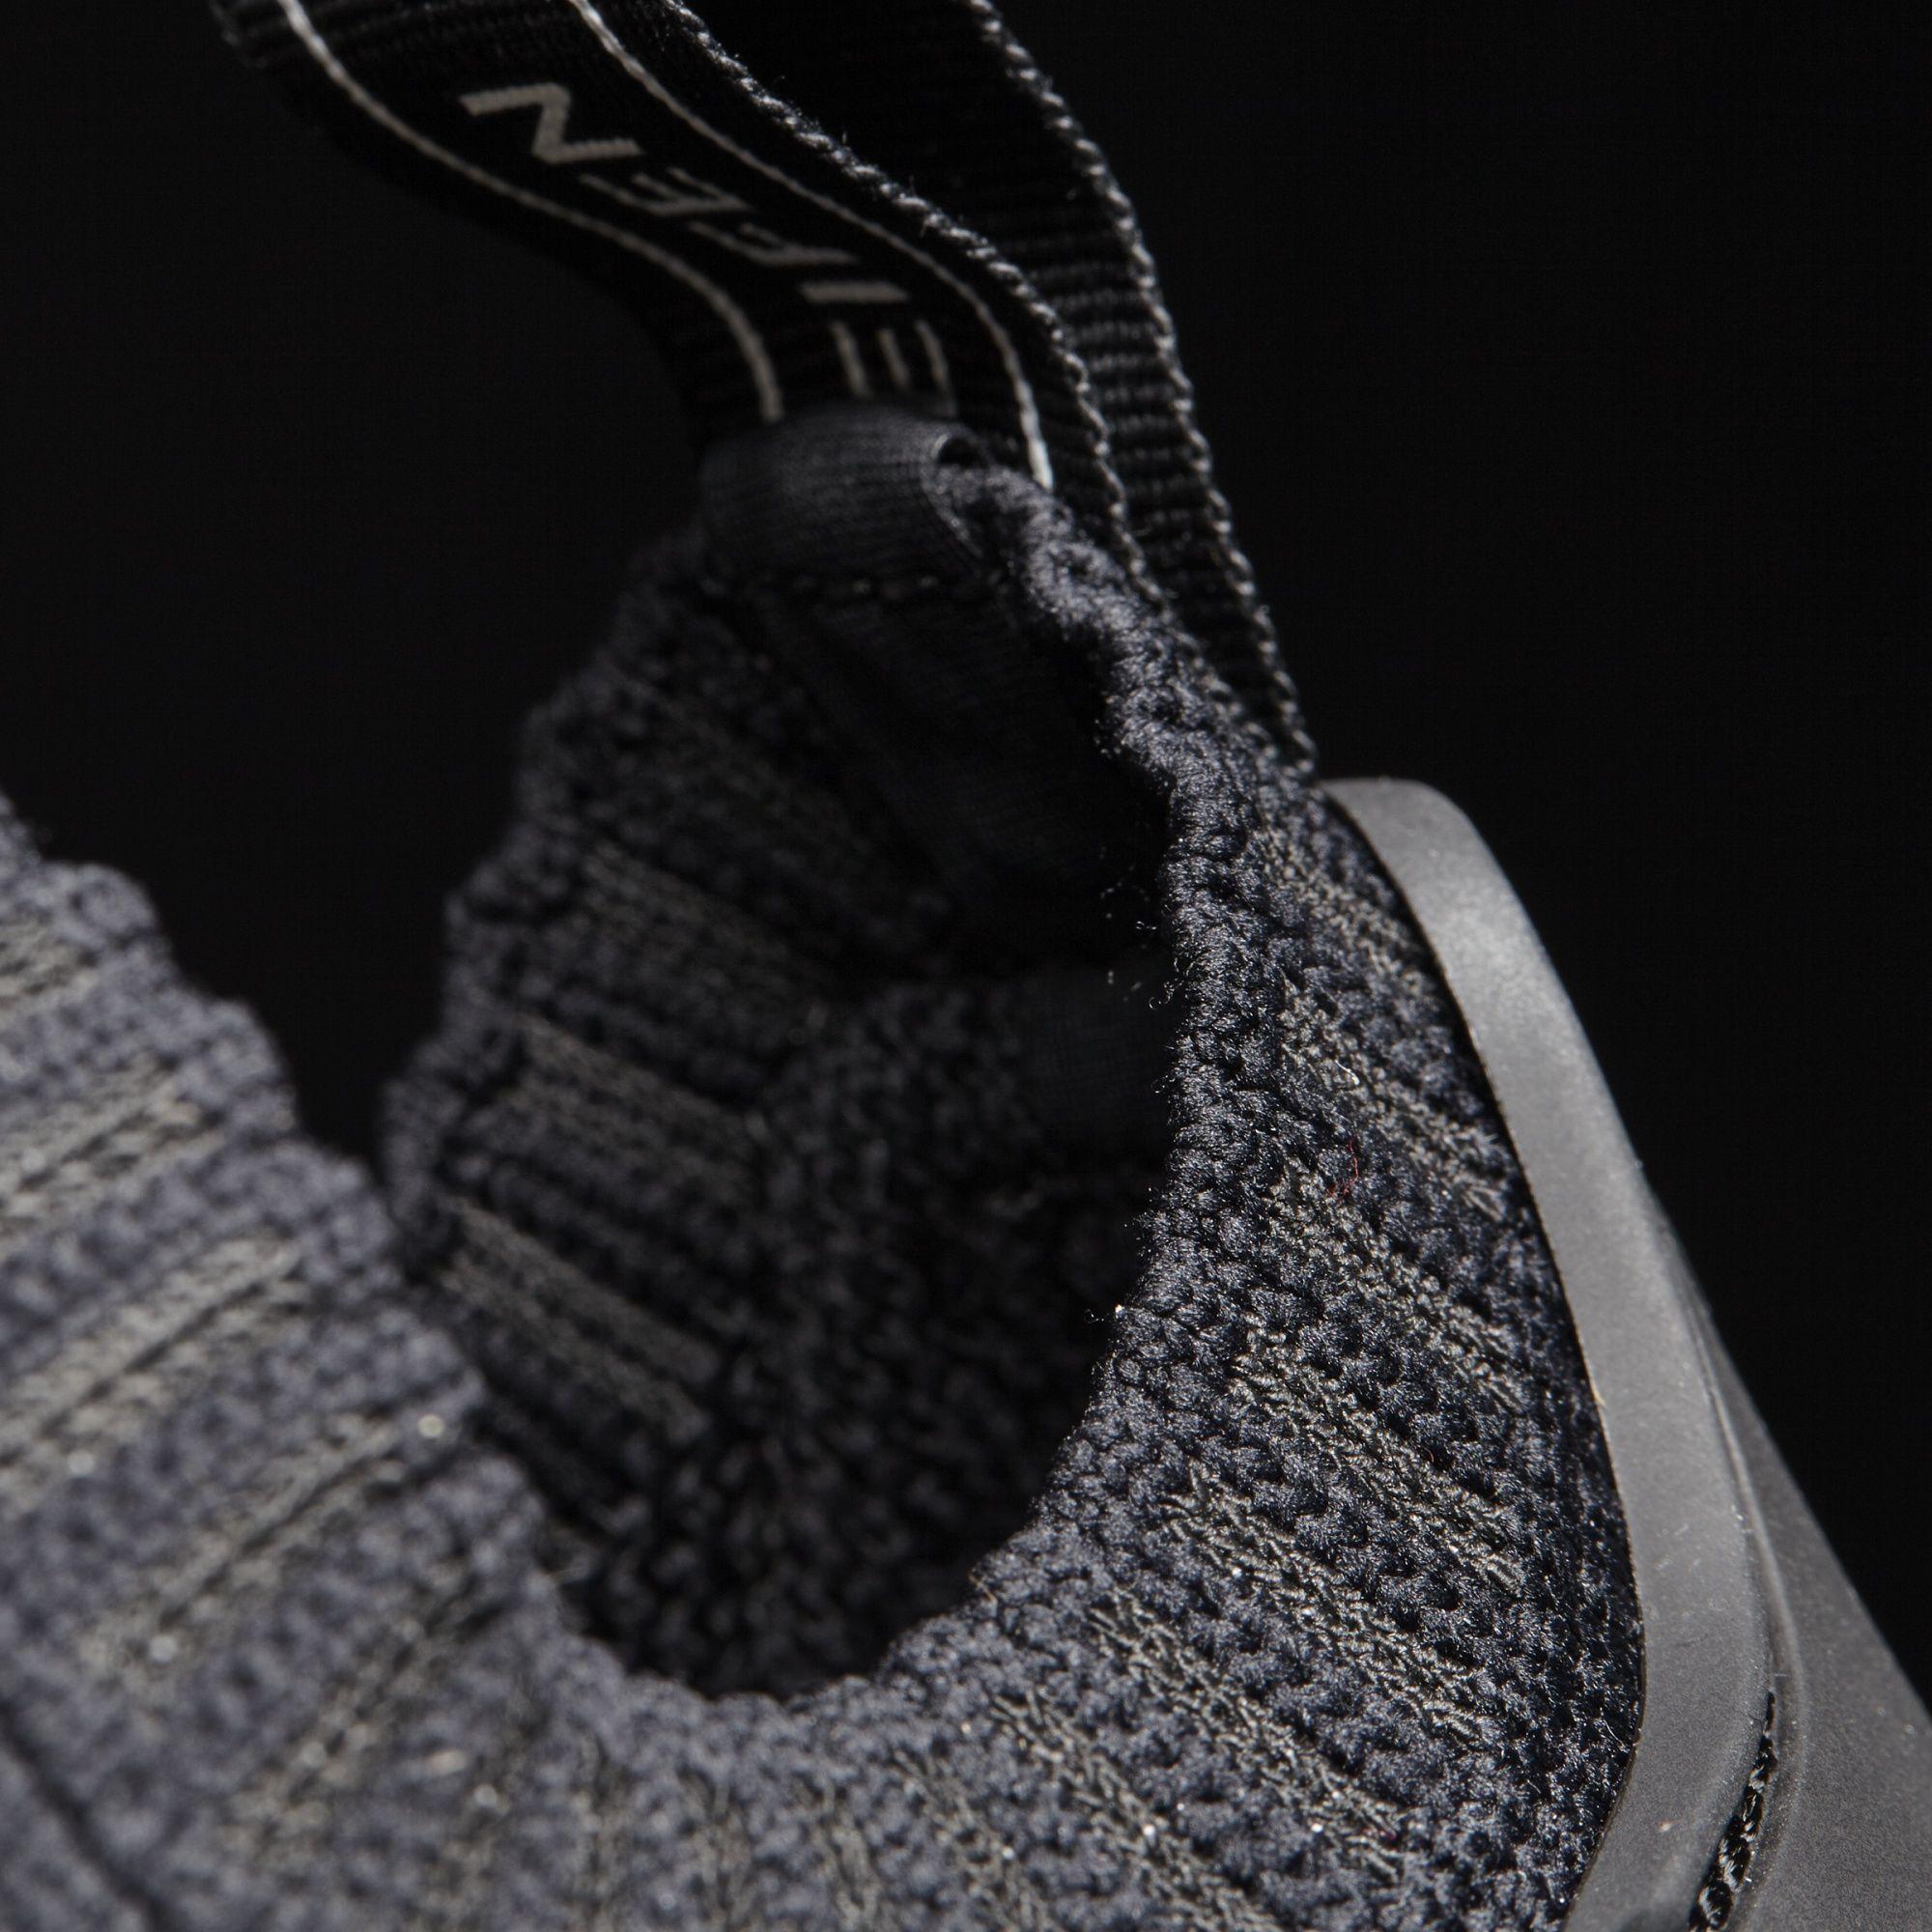 OG Adidas NMD S79168 Collar Detail